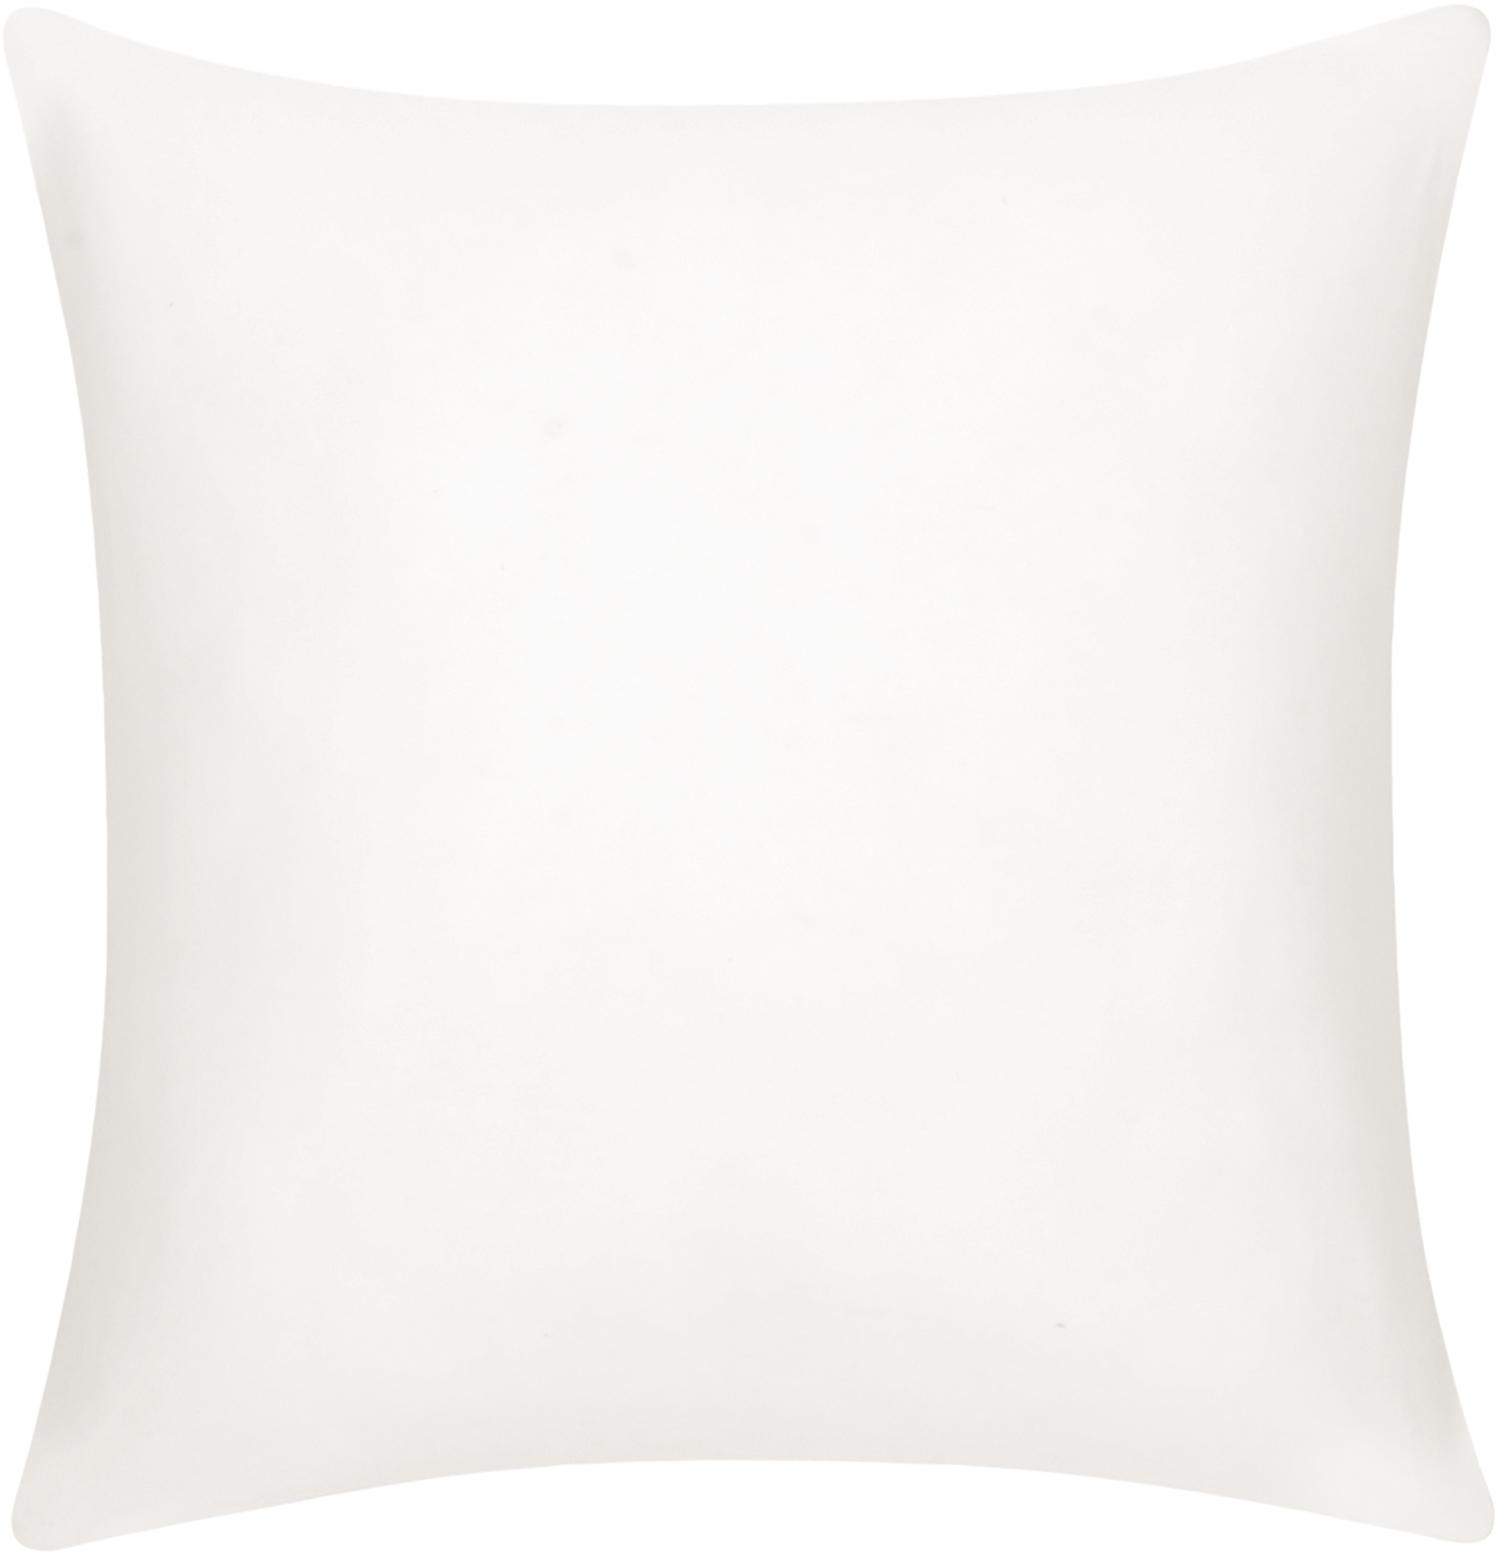 Federa arredo in cotone bianco Mads, 100% cotone, Bianco crema, Larg. 40 x Lung. 40 cm